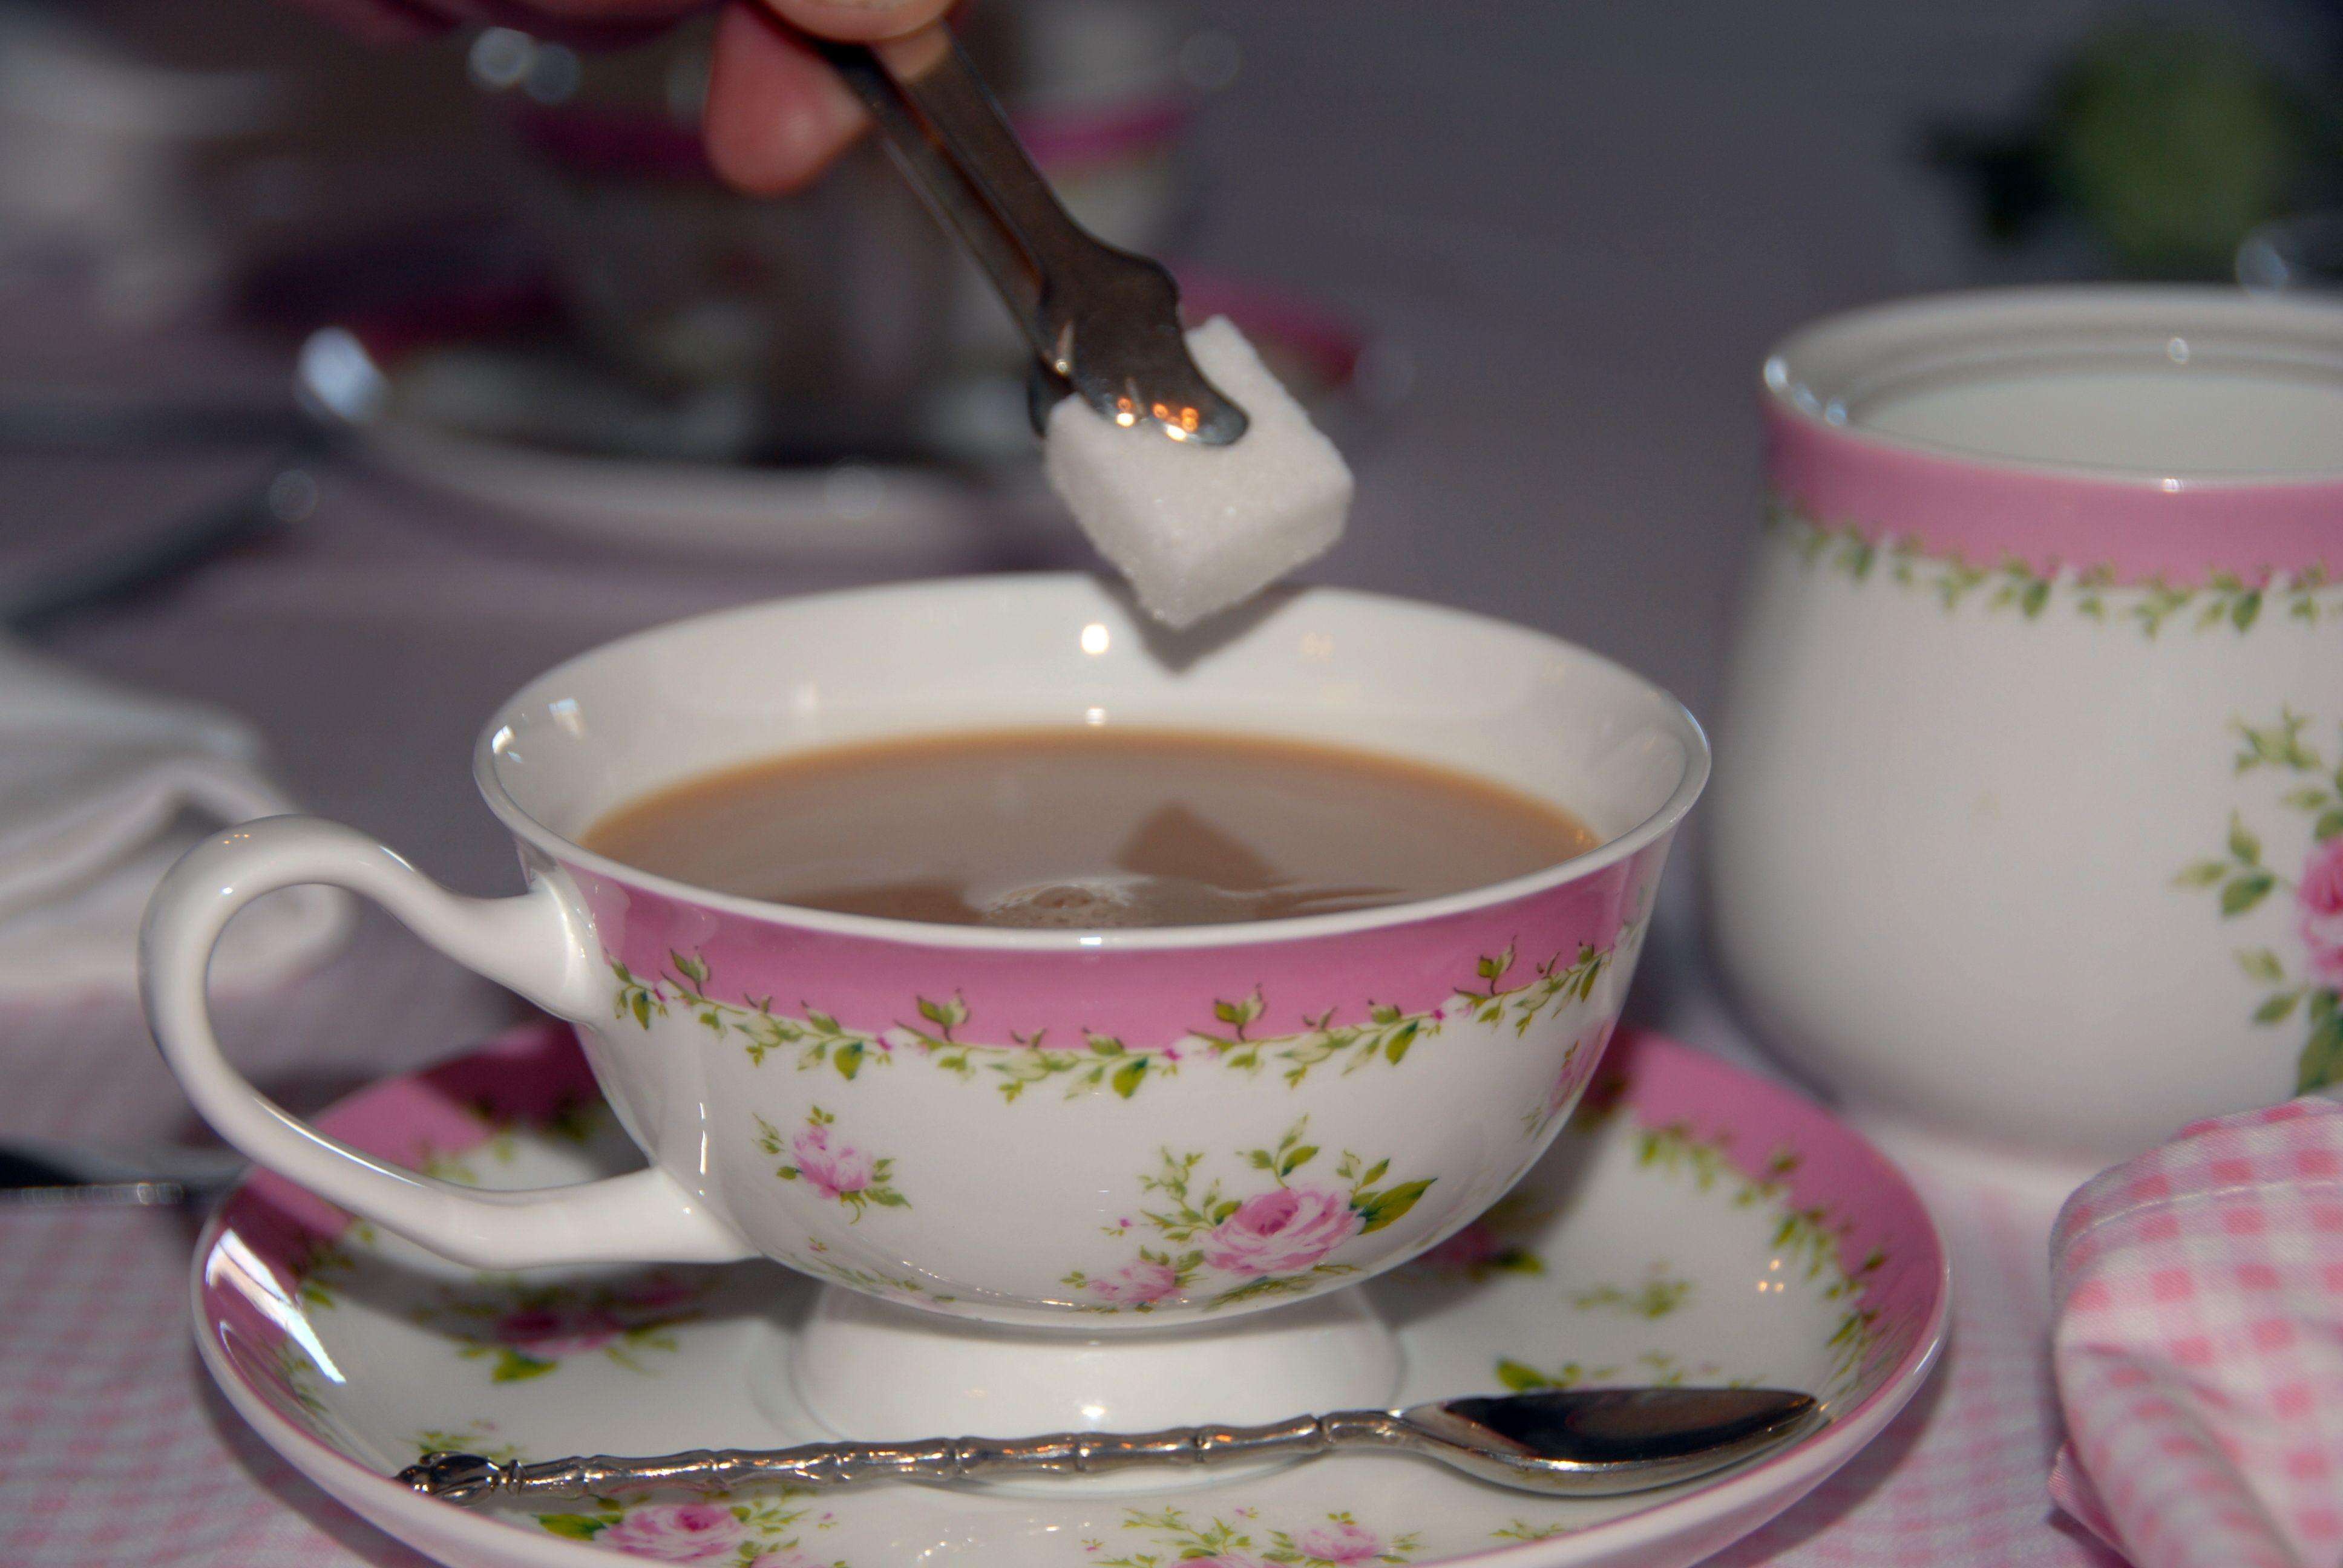 Moments & Memories Tea Room  34 Camp Street, Beechworth, Victoria, 3747 Phone 03 57282273  https://www.facebook.com/pages/Moments-Memories-Tea-Room/260063697347323?ref=hl